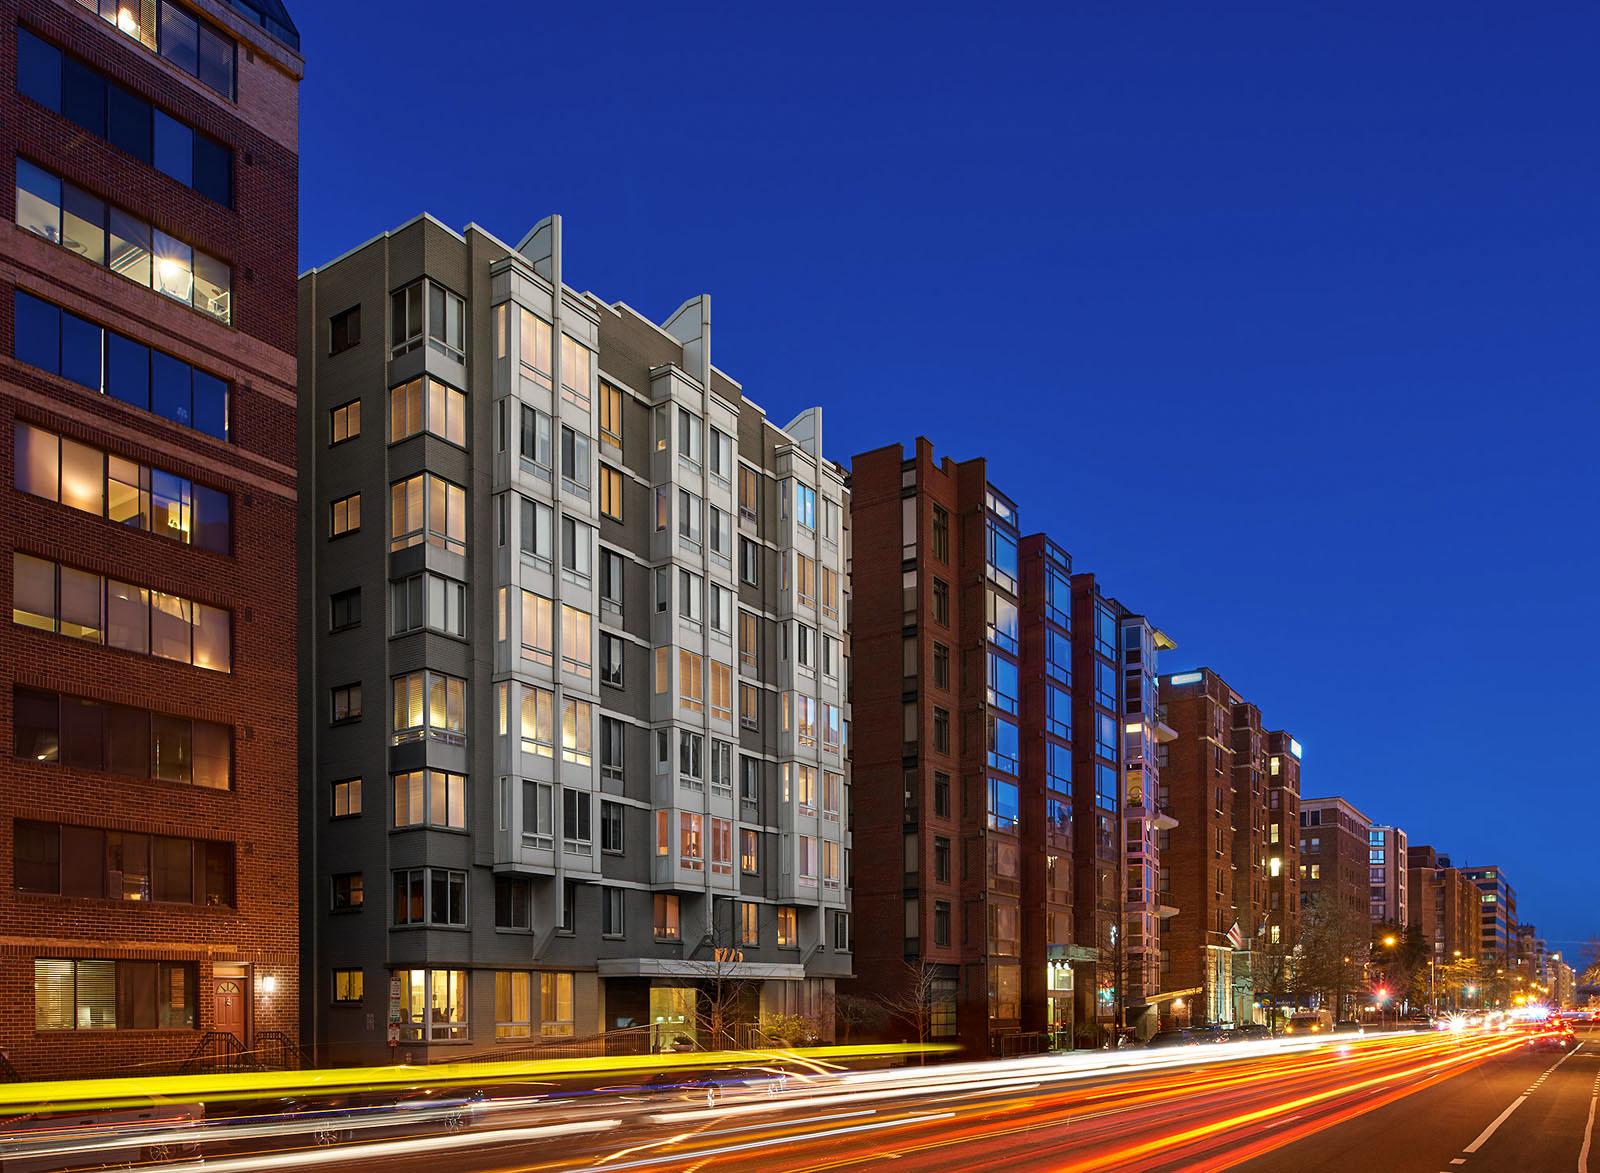 1225 Lofts apartment building at night